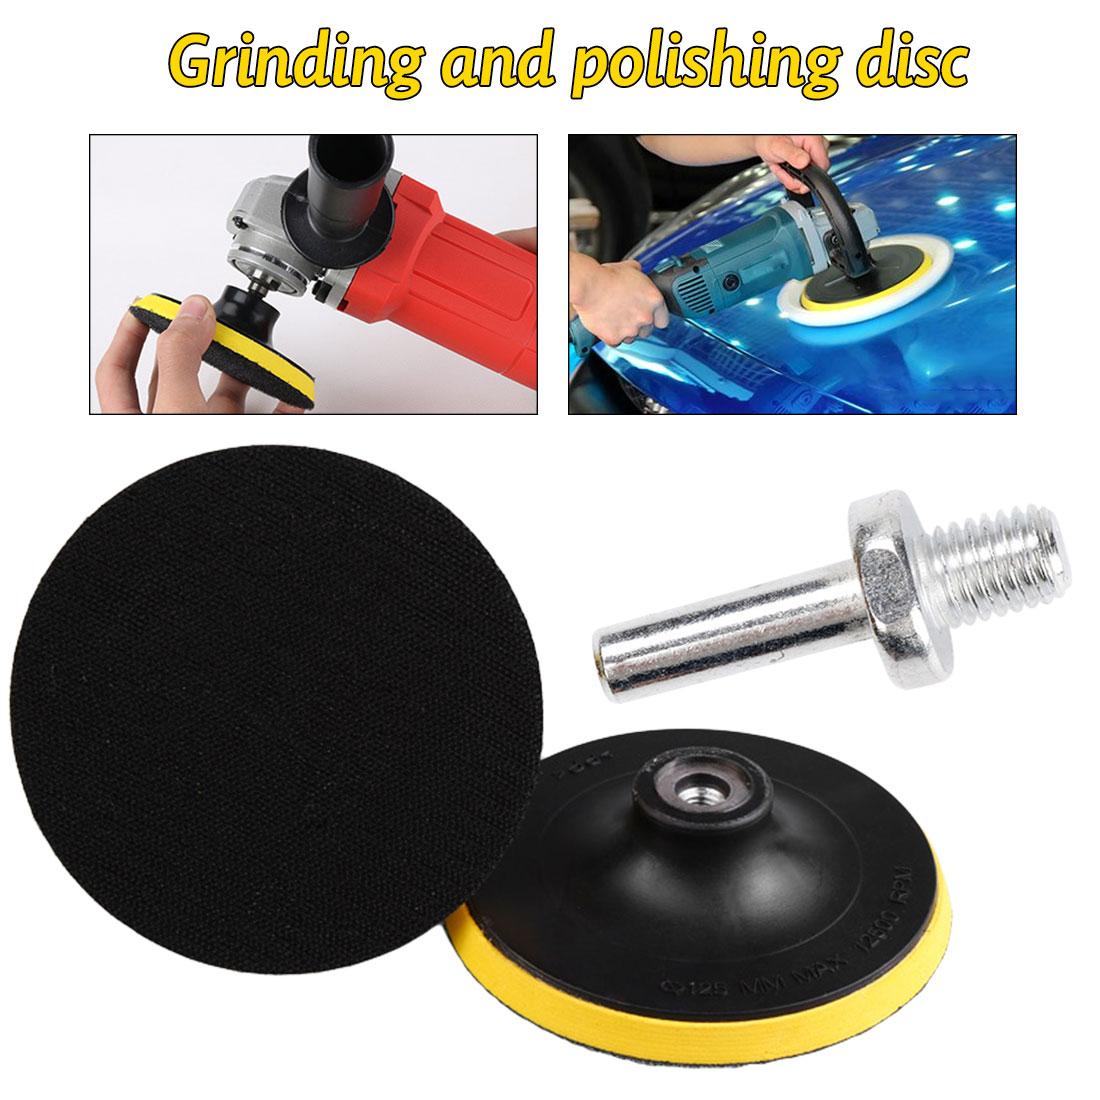 3 Inch Sander Disc Disk Sandpaper Self-adhesive Sand Paper Pad Abrasive Tool For Electric Grinder